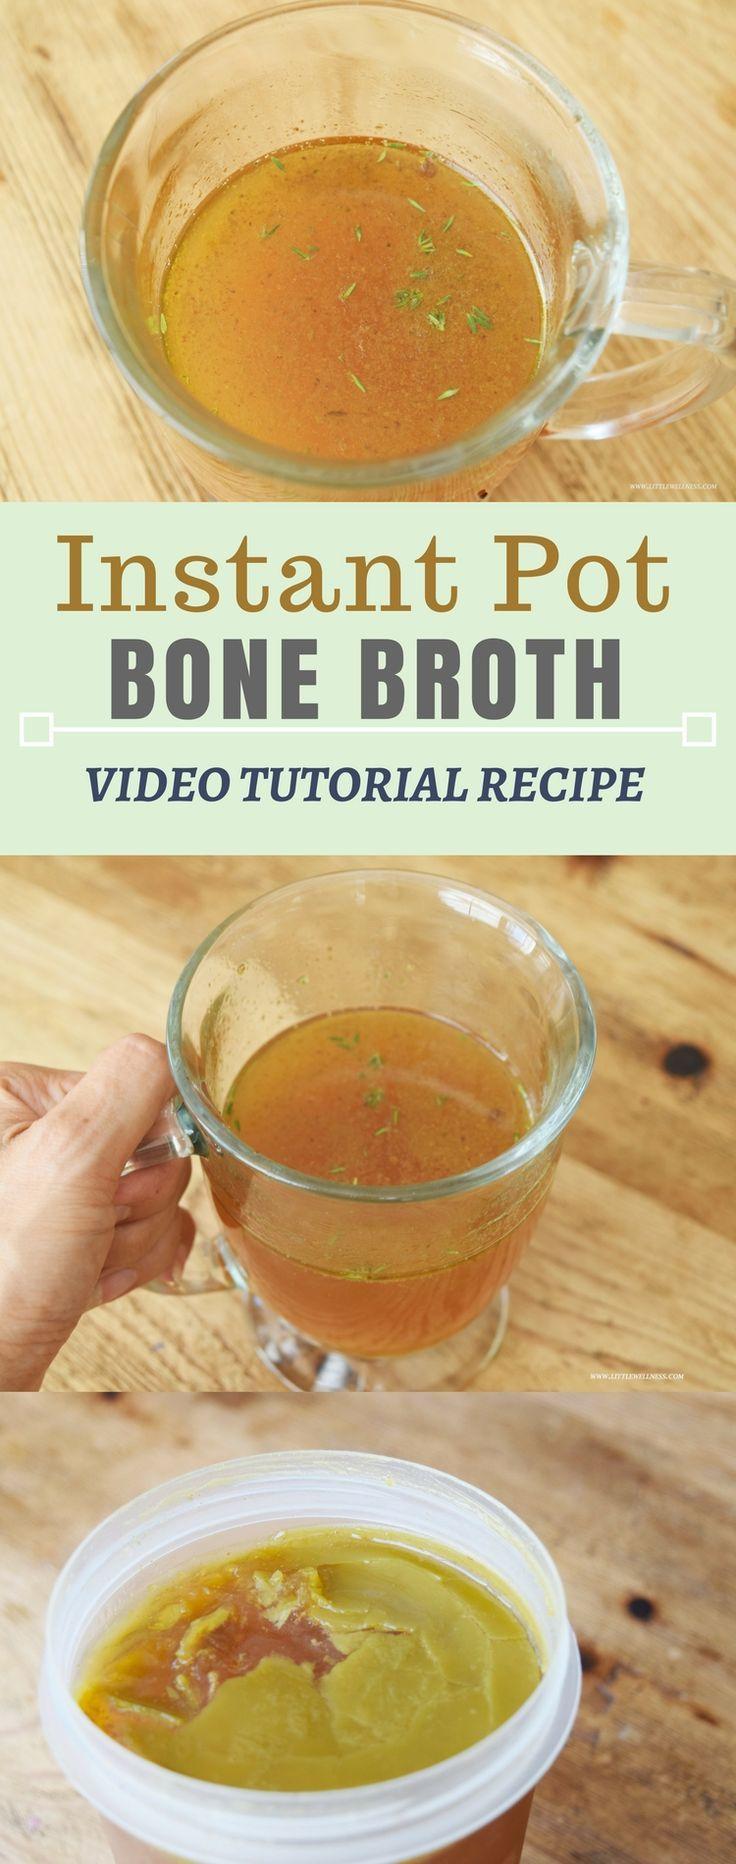 Bone Broth Instant Pot Video Tutorial Recipe. Slow cooker